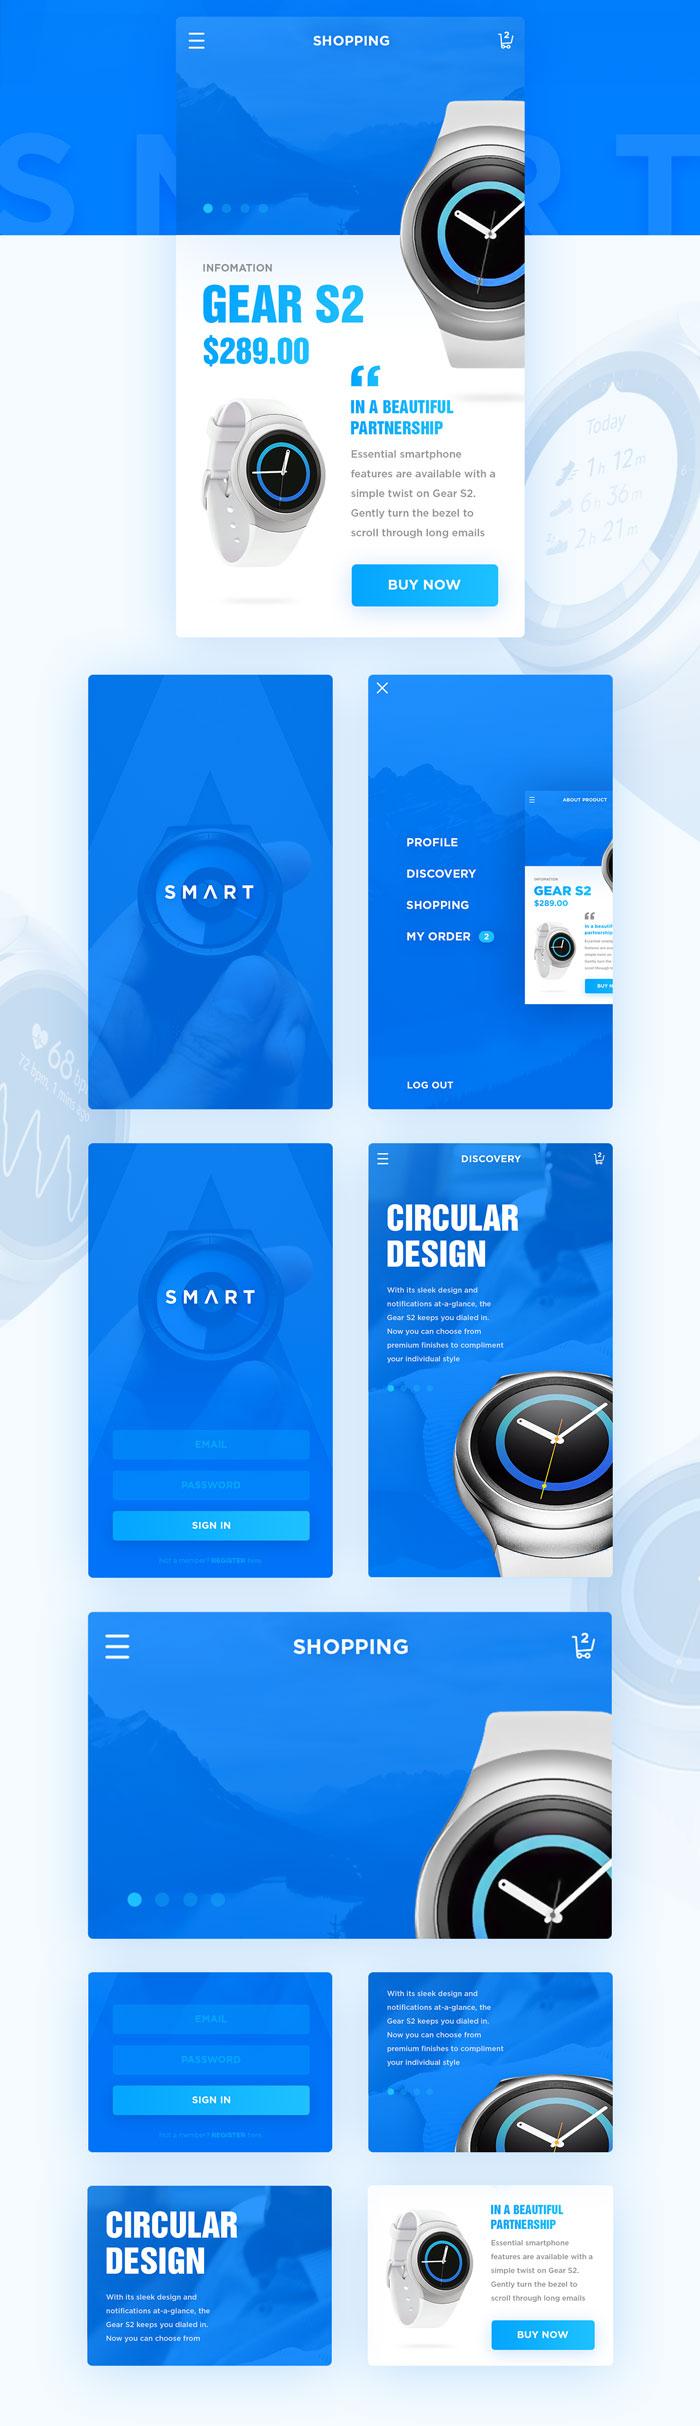 p548 - قالب اپلکیشن فروشگاهی آبی / اینترفیس UX و UI موبایل اندورید و ios با صفحات خرید، عضویت و ورود